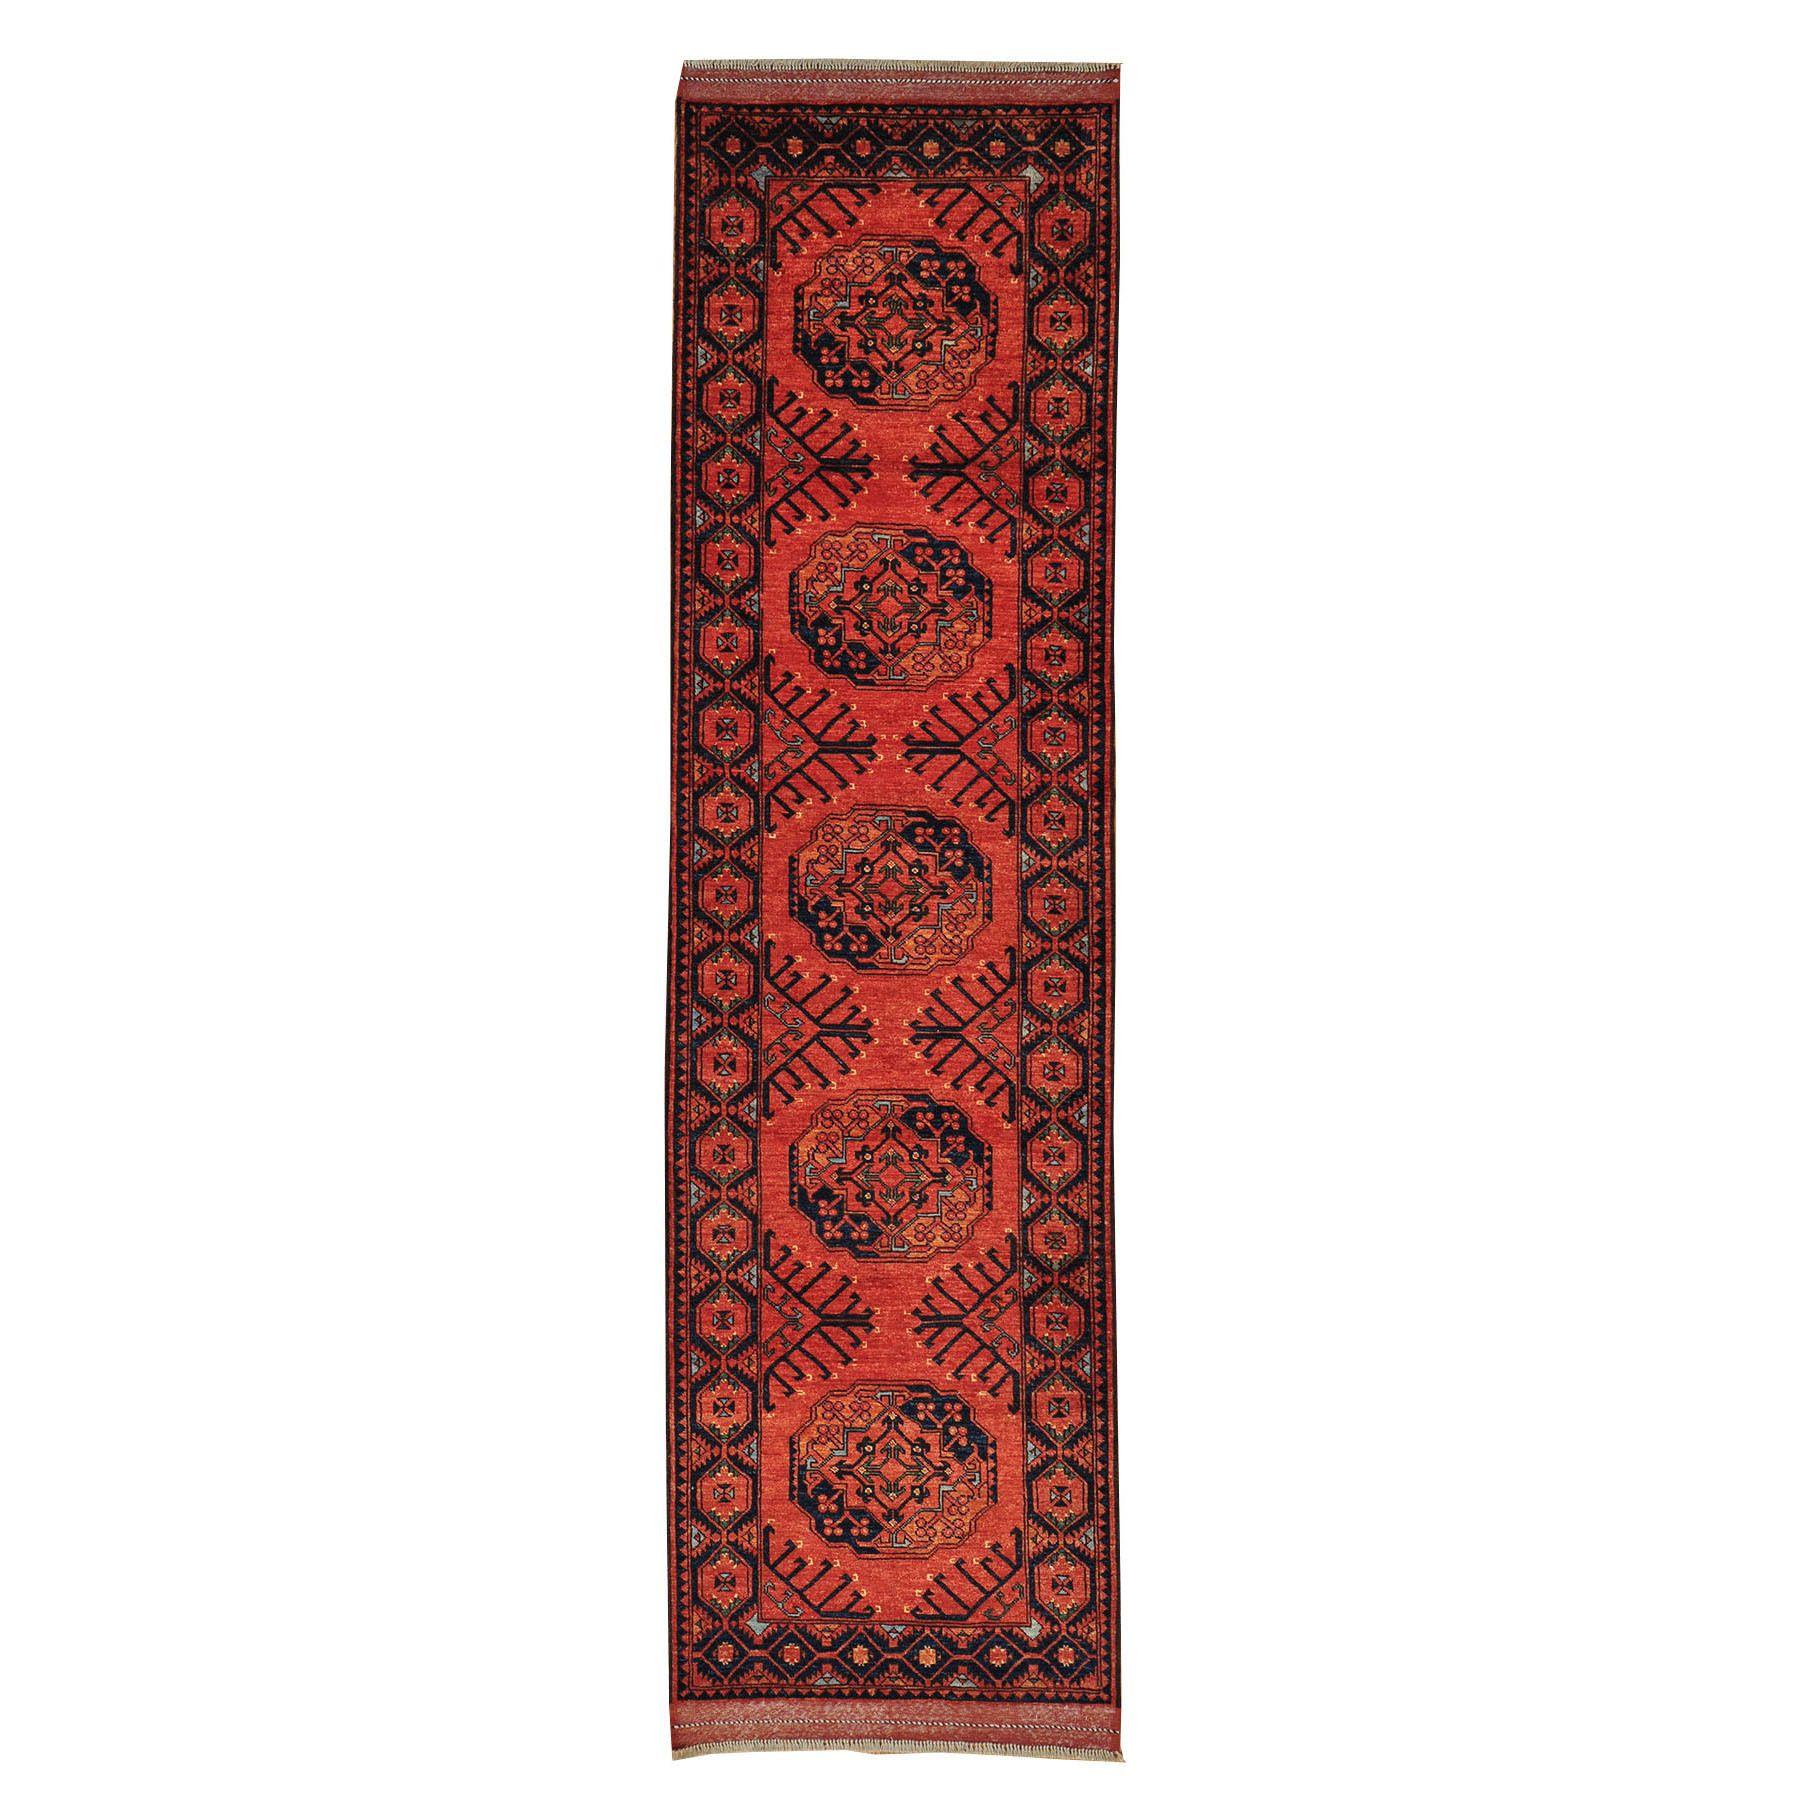 "1800getarug Runner Handmade Afghan Ersari Red Oriental Wool Area Rug (2'10 x 10'2) (Exact Size: 2'10"" x 10'2""), Size 3' x 10'"